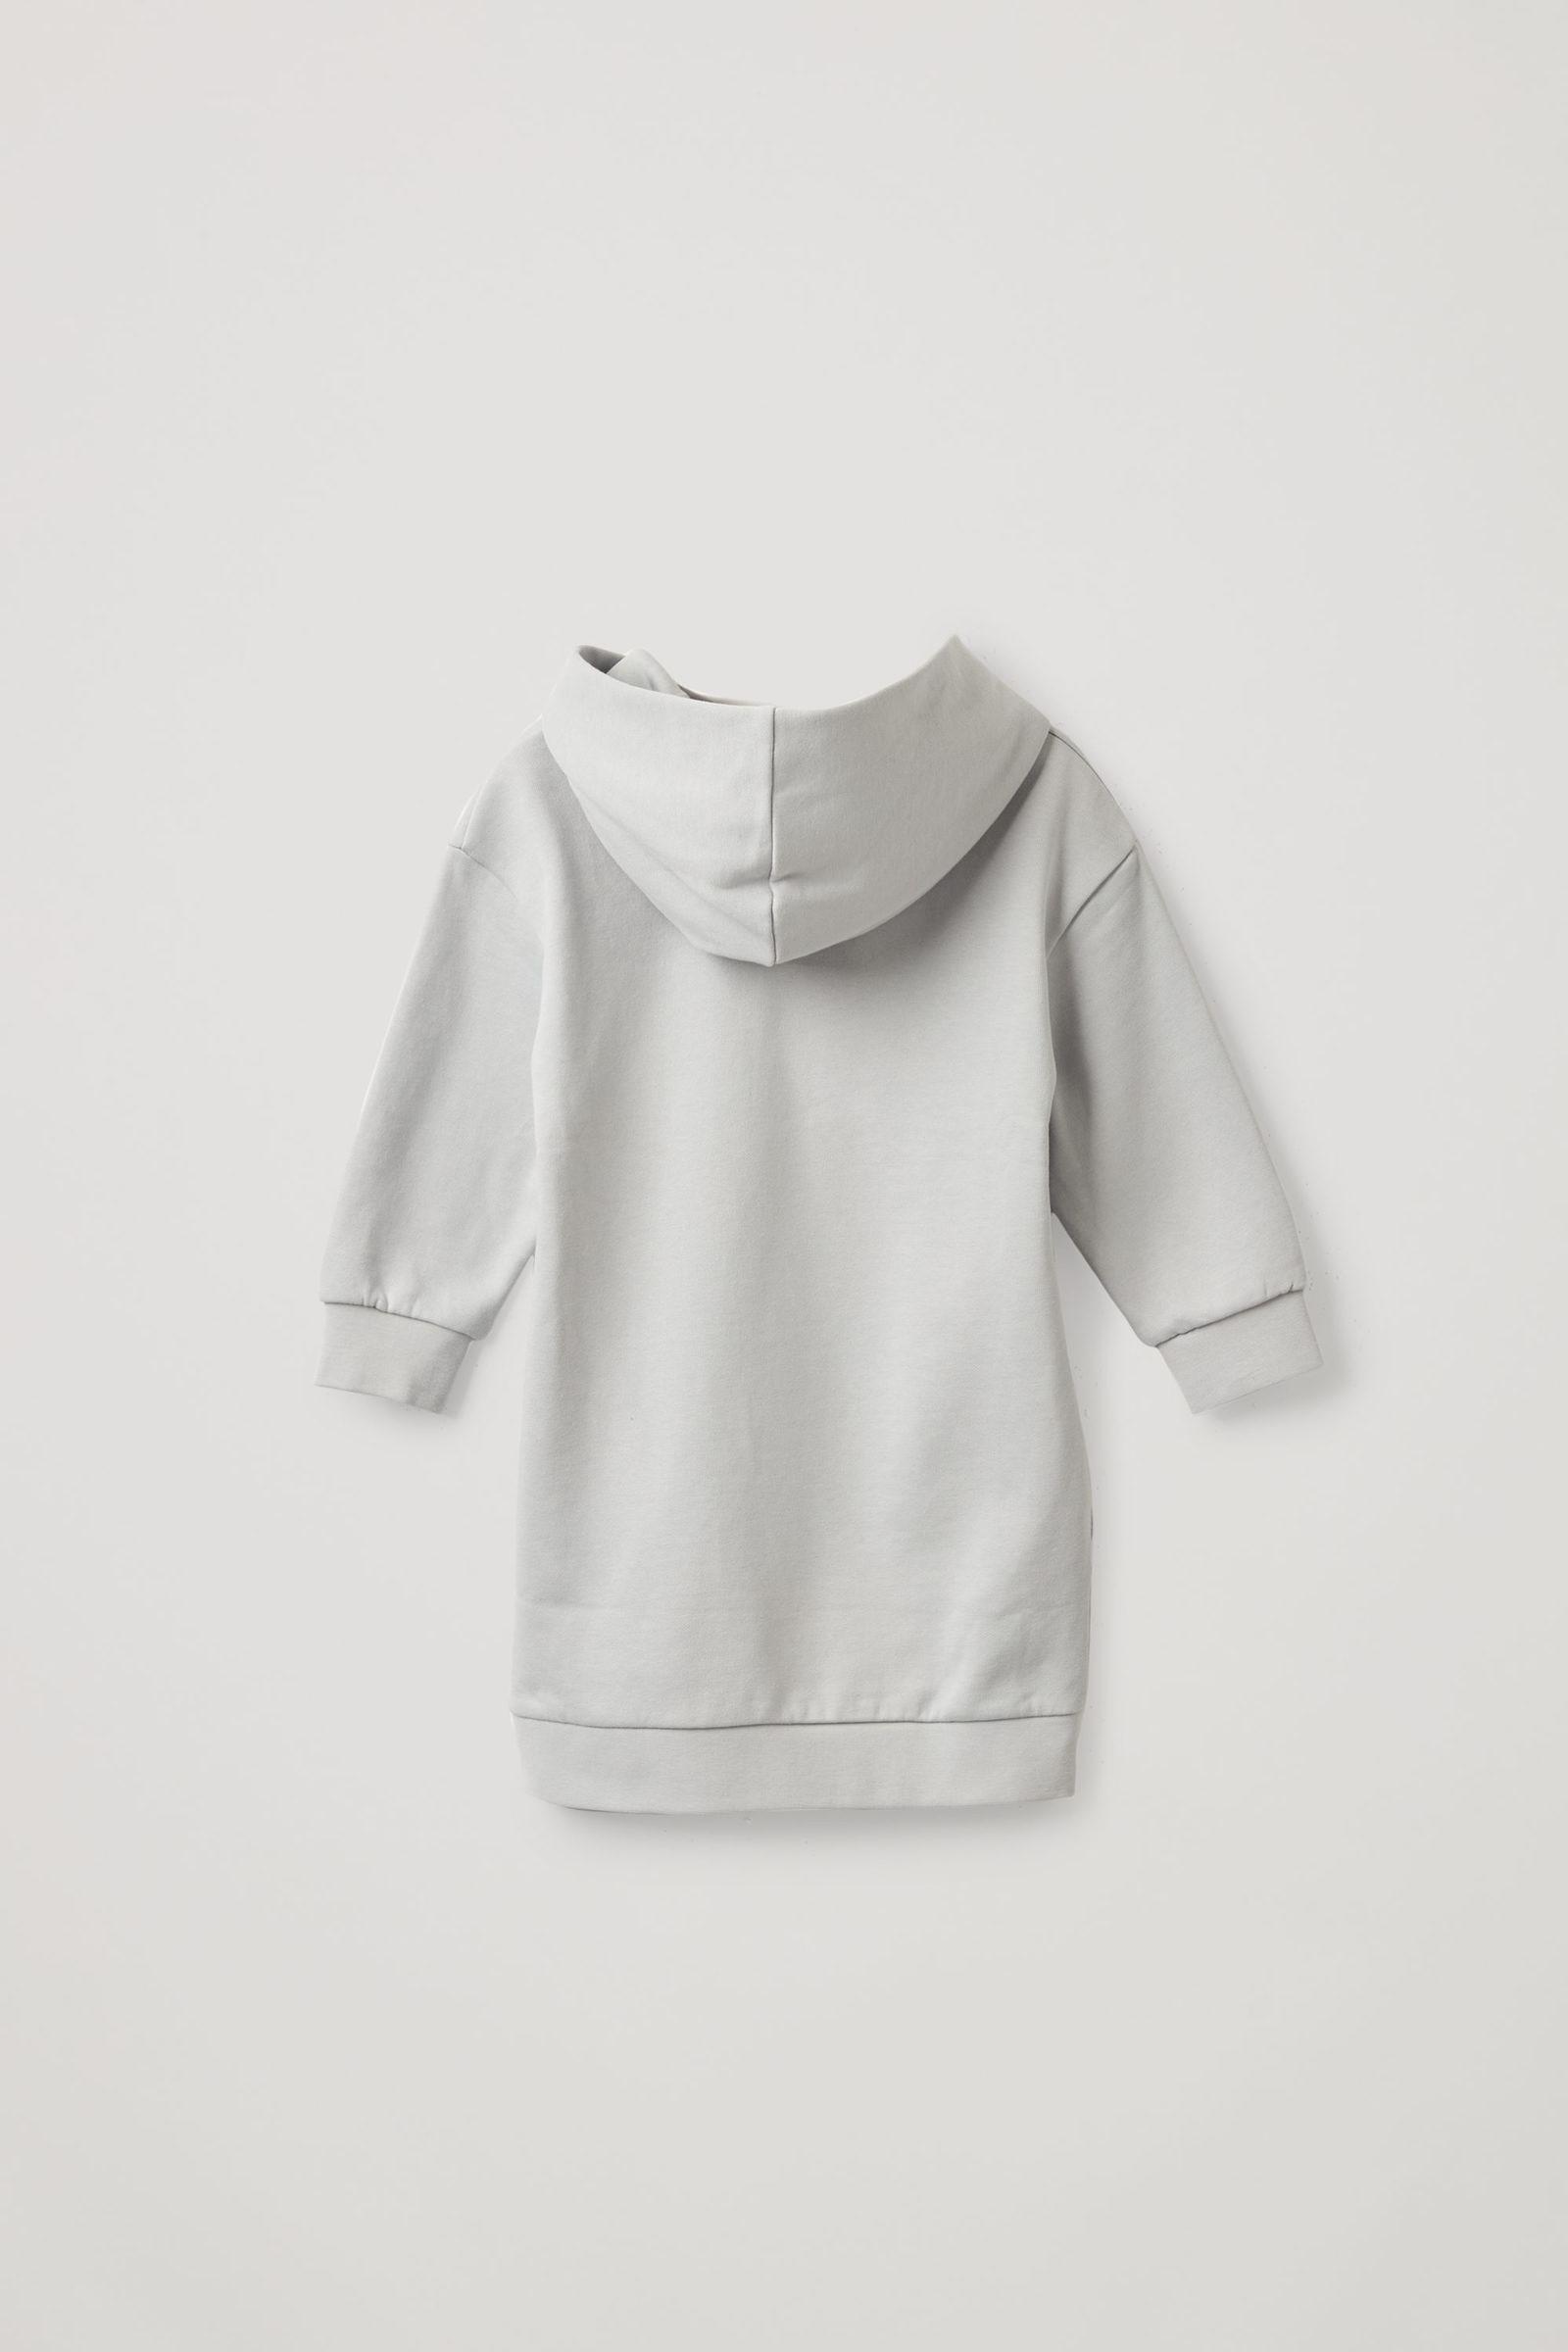 COS 프린티드 코튼 후드 드레스의 멀티컬러컬러 Product입니다.